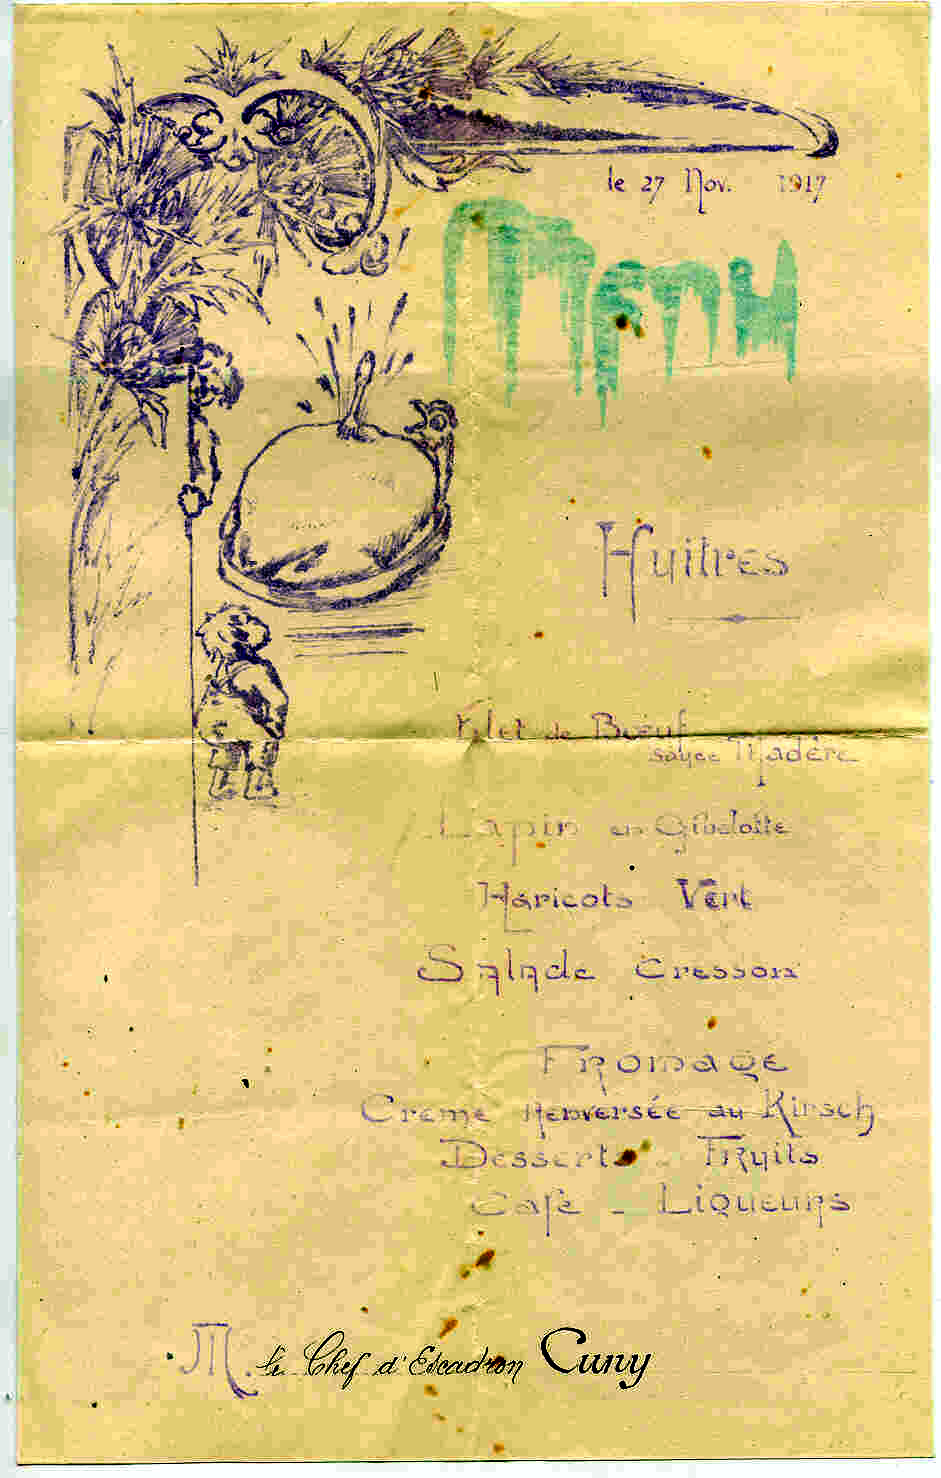 1917-4-RET 1917 menu 2.jpg